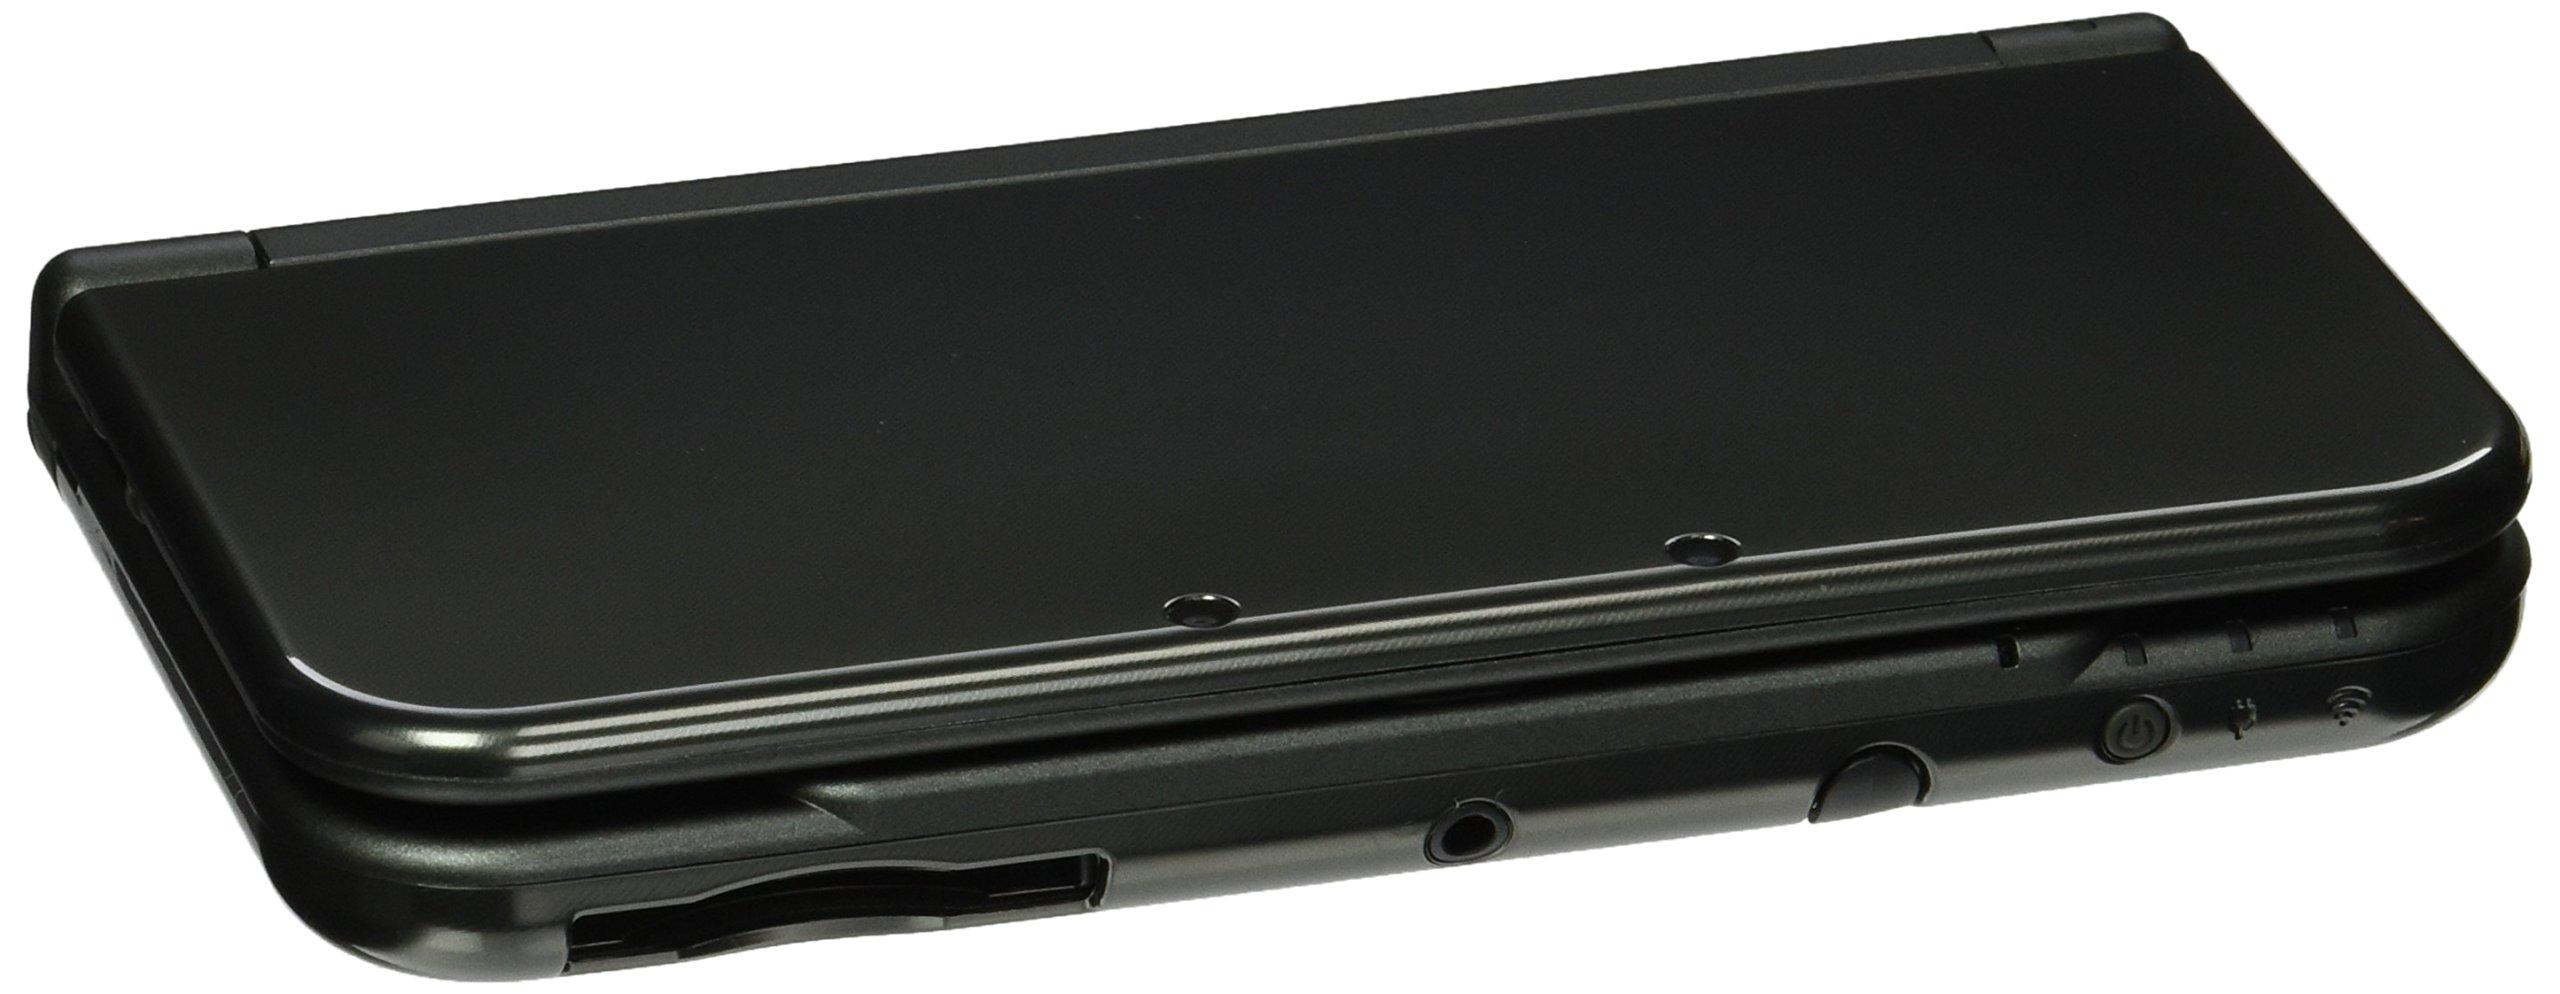 Nintendo New 3DS XL - Black by Nintendo (Image #4)